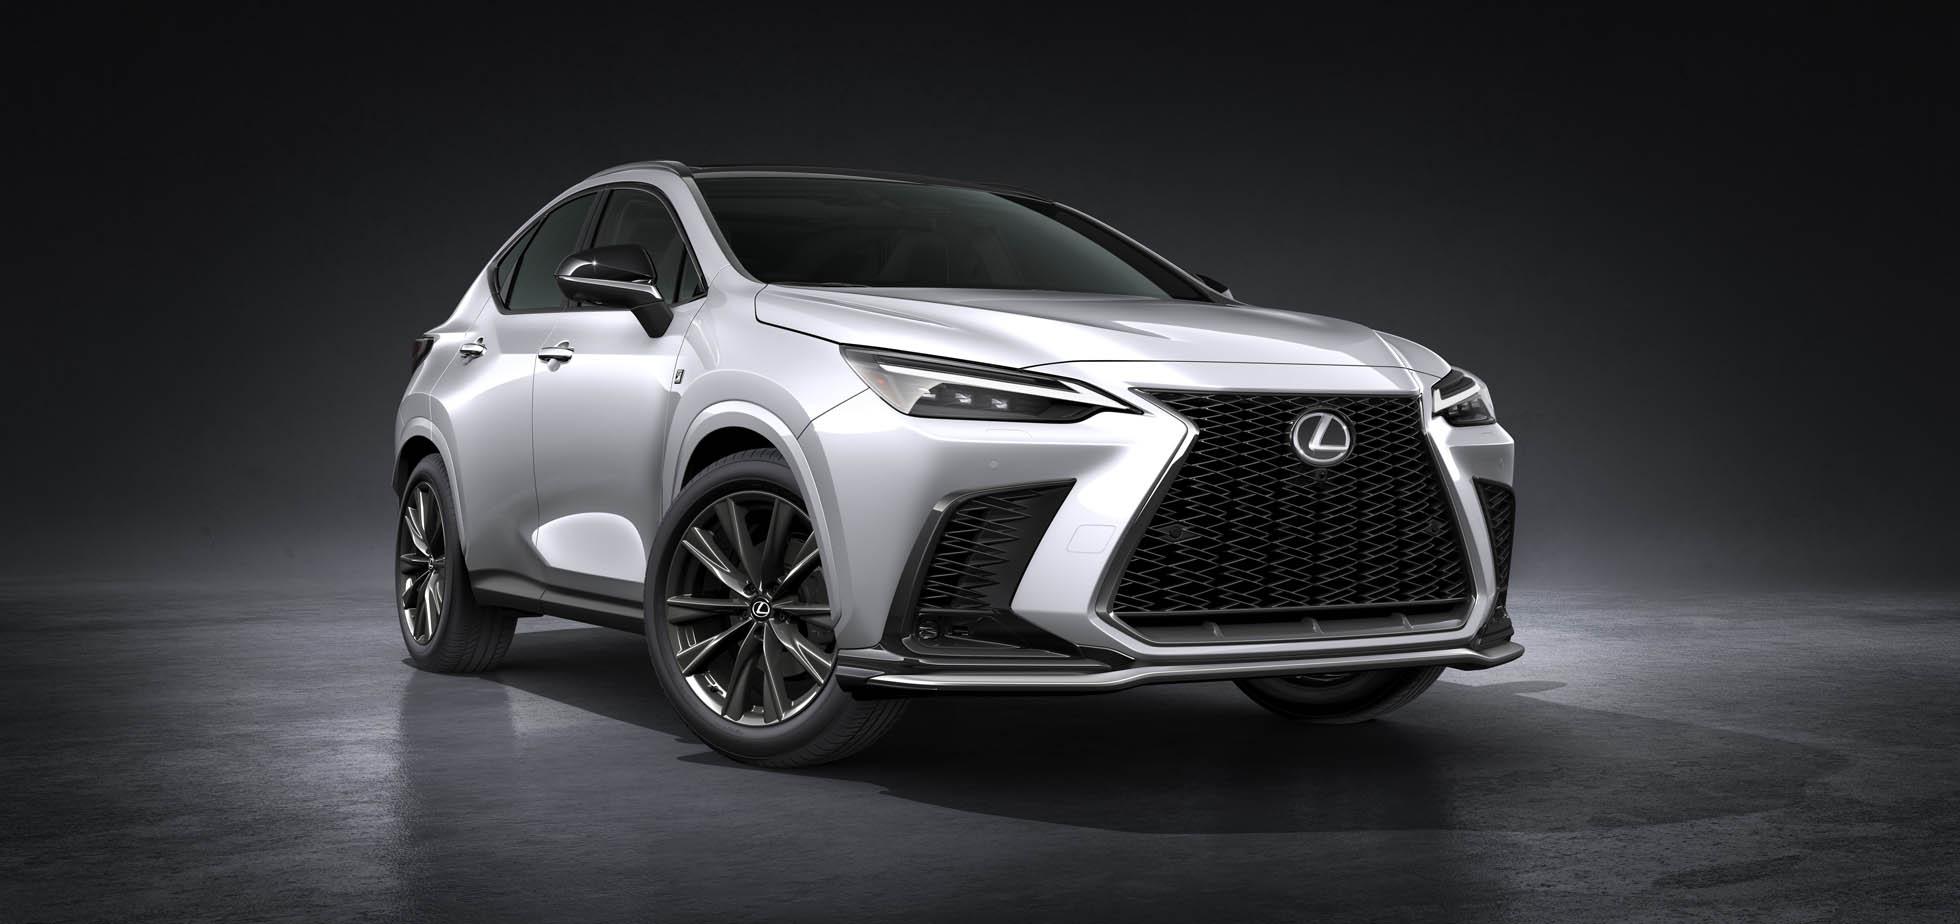 Lexus NX earmarked for early 2022 launch